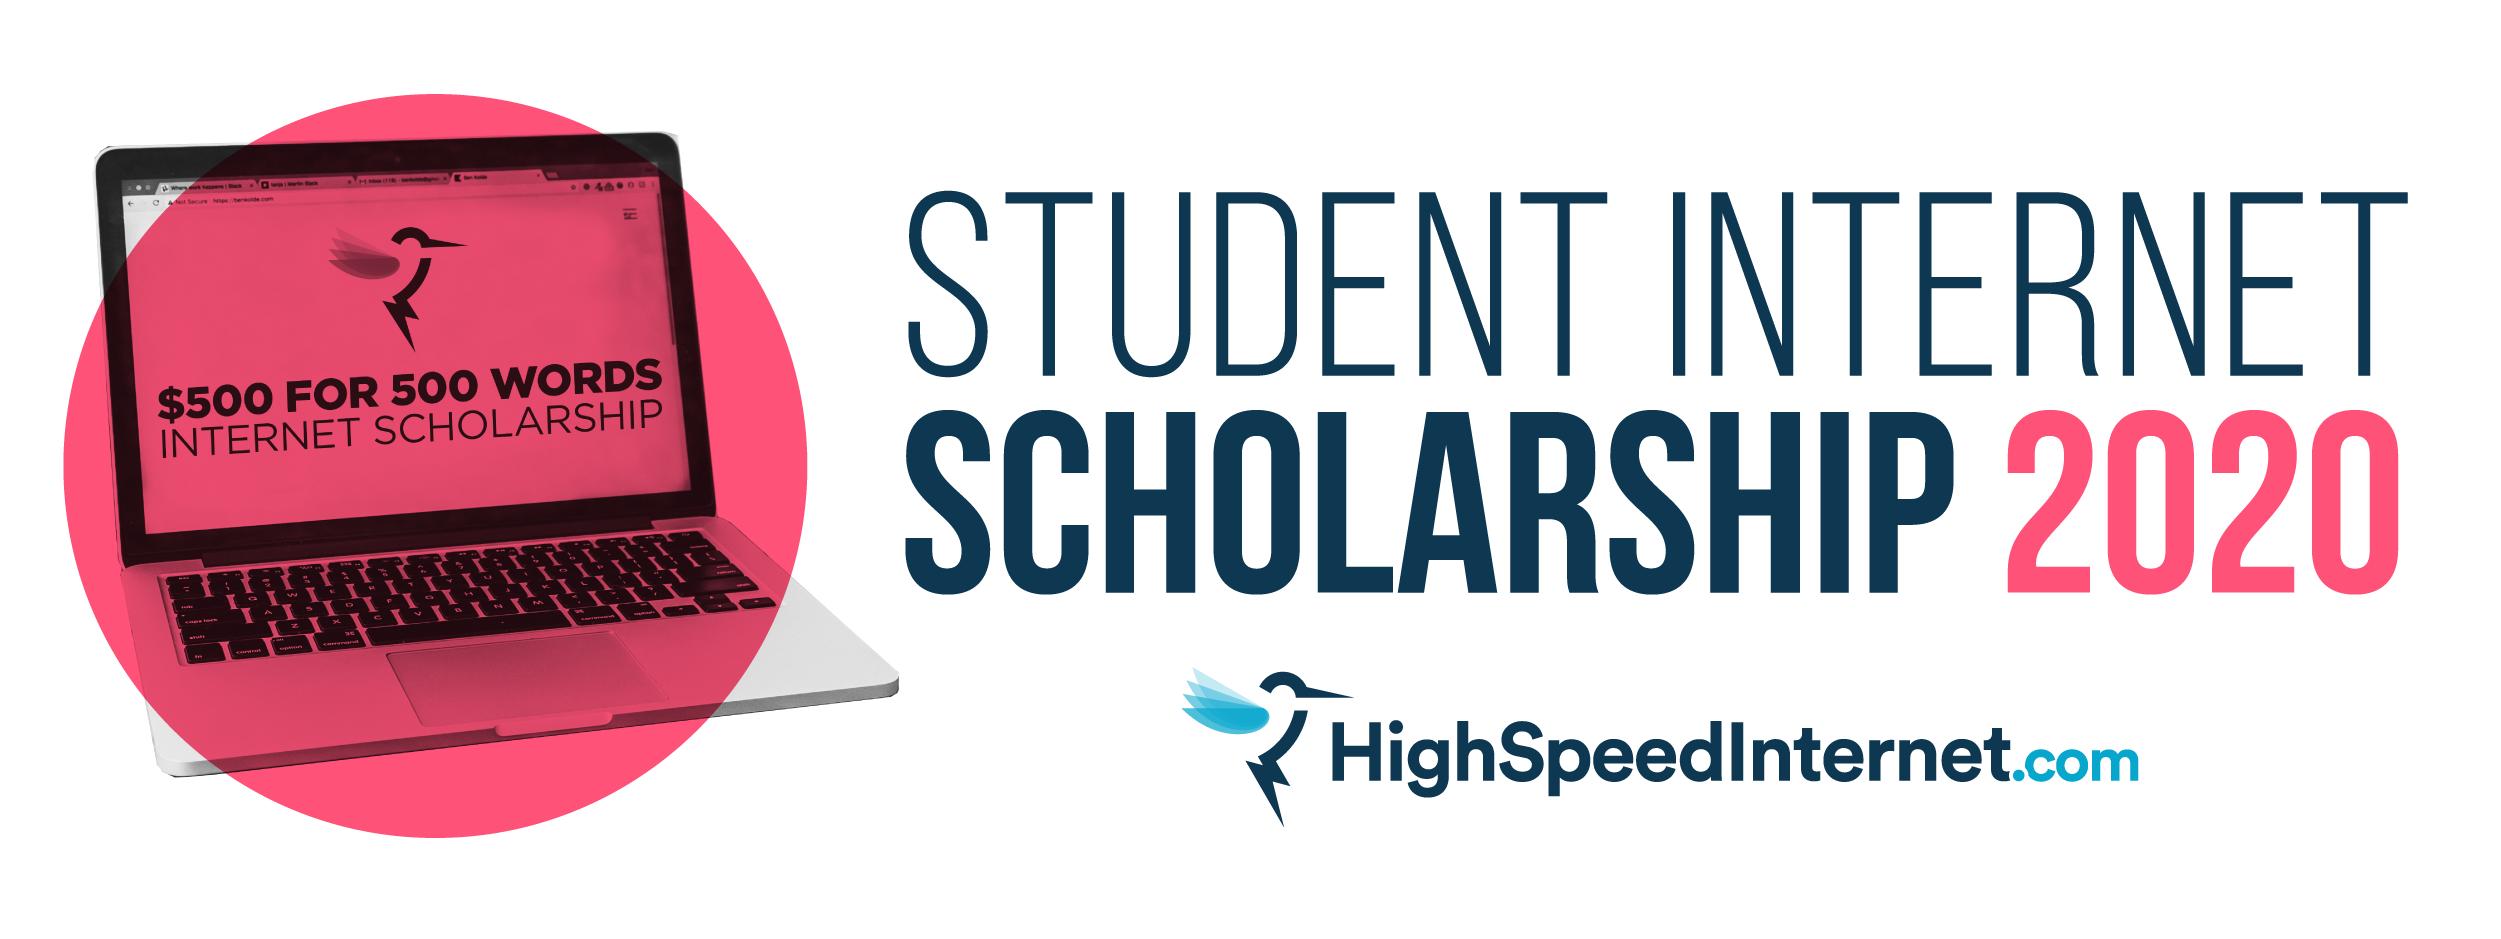 HighSpeedInternet.com internet scholarship 2020